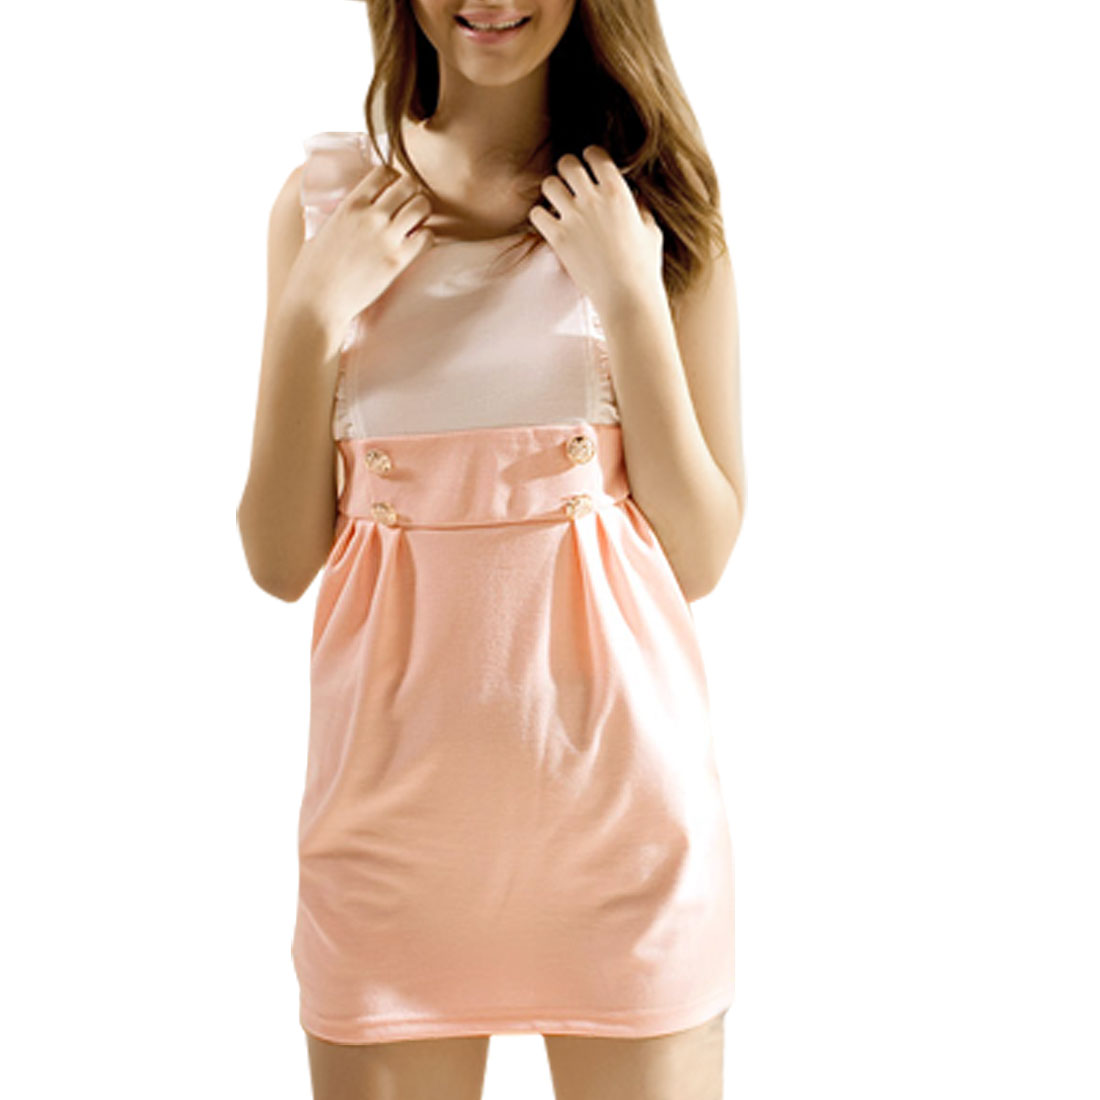 Lady Scoop Neck Sleeveless Back Zipper White Pink Dress XS